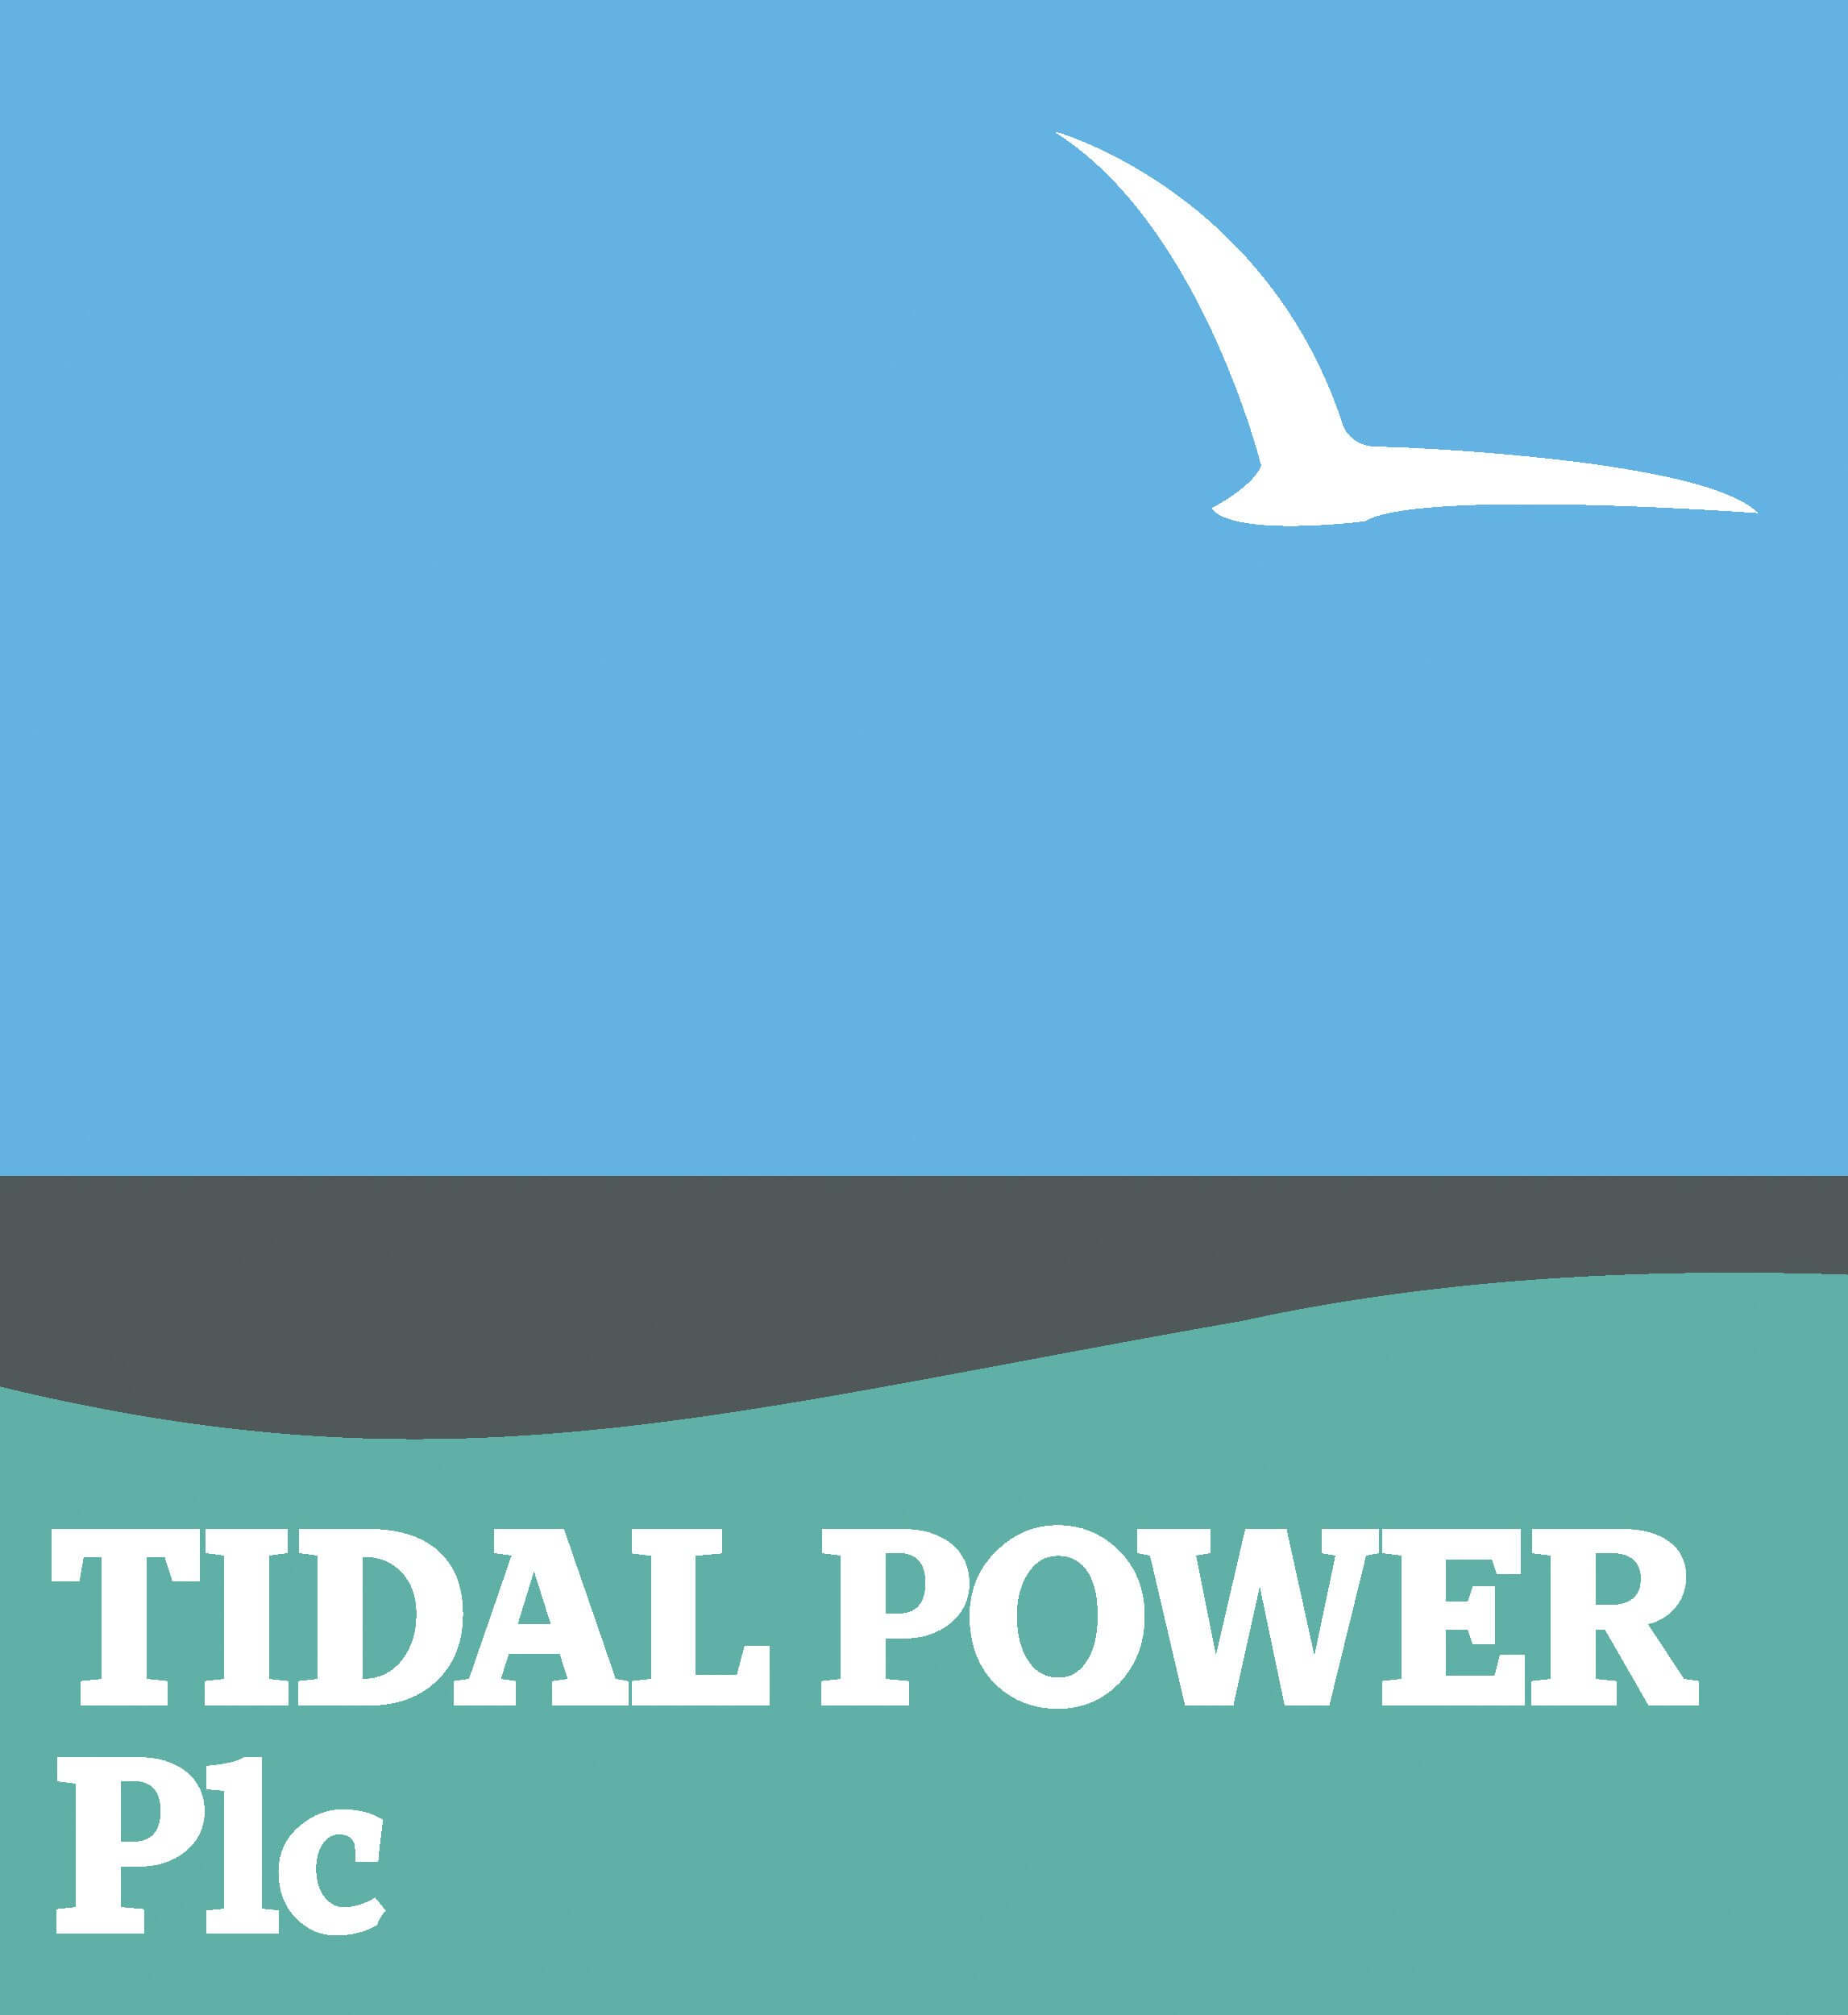 Tidal Power Plc